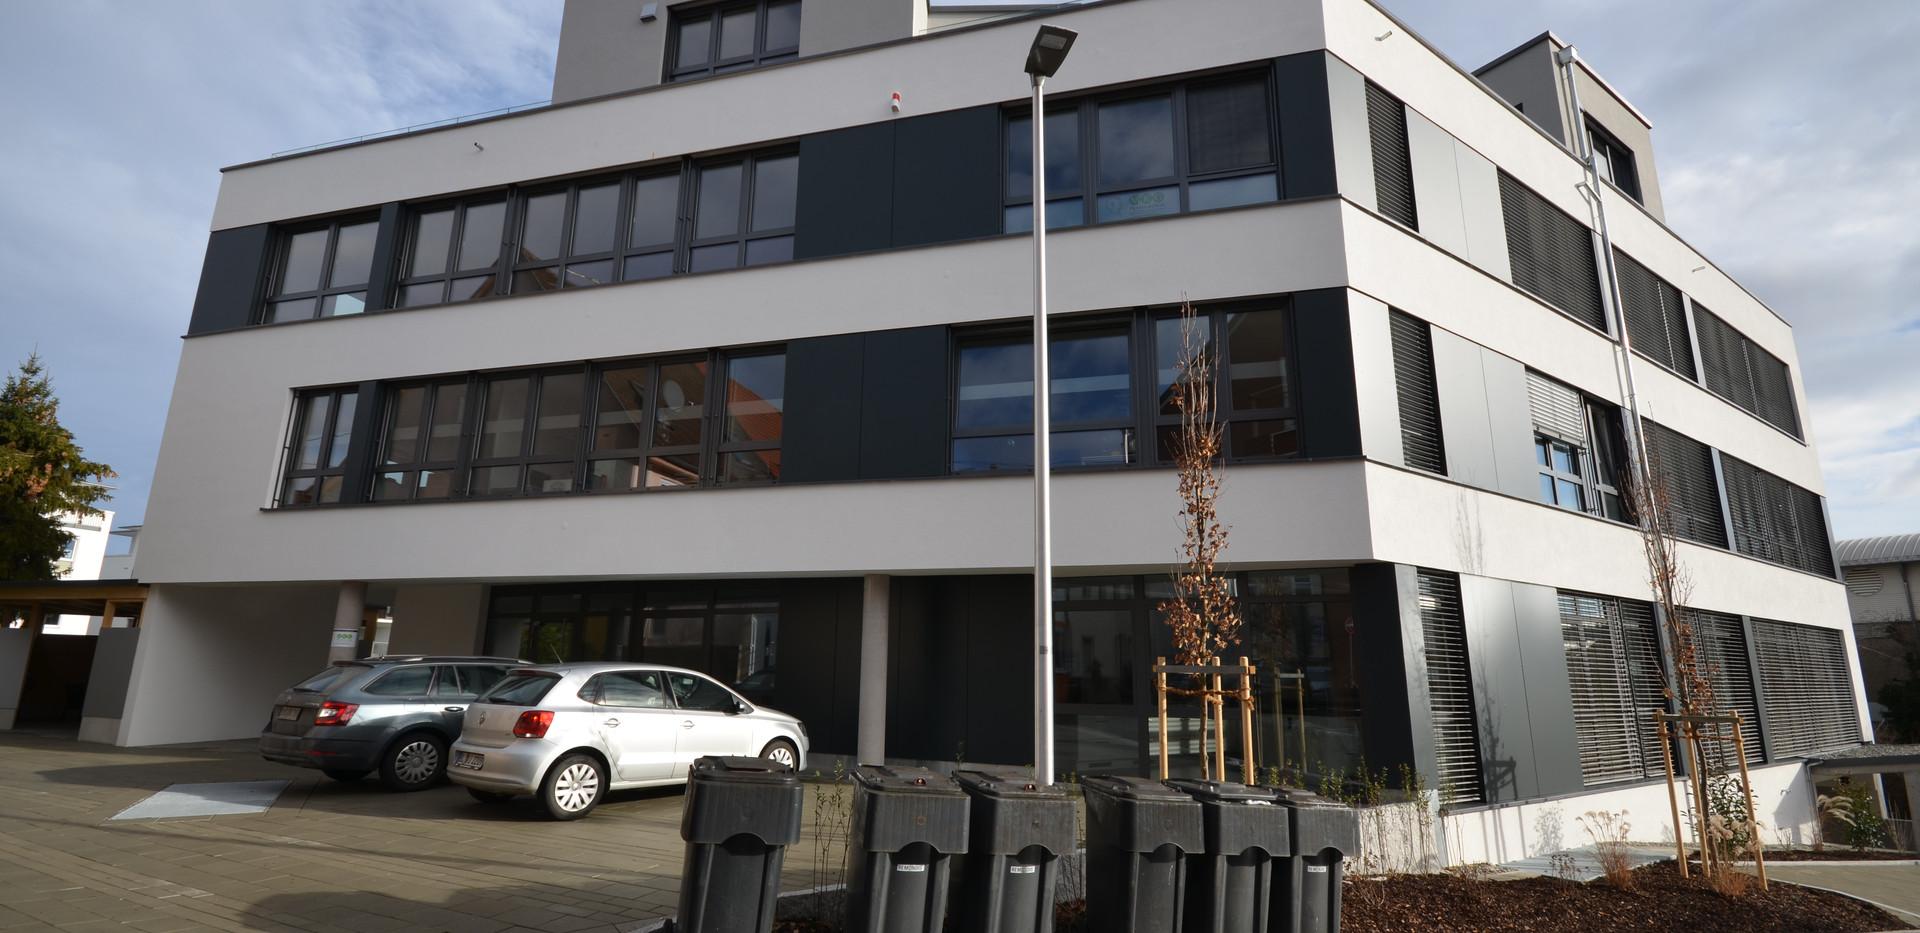 Gesundheitszentrum Balingen